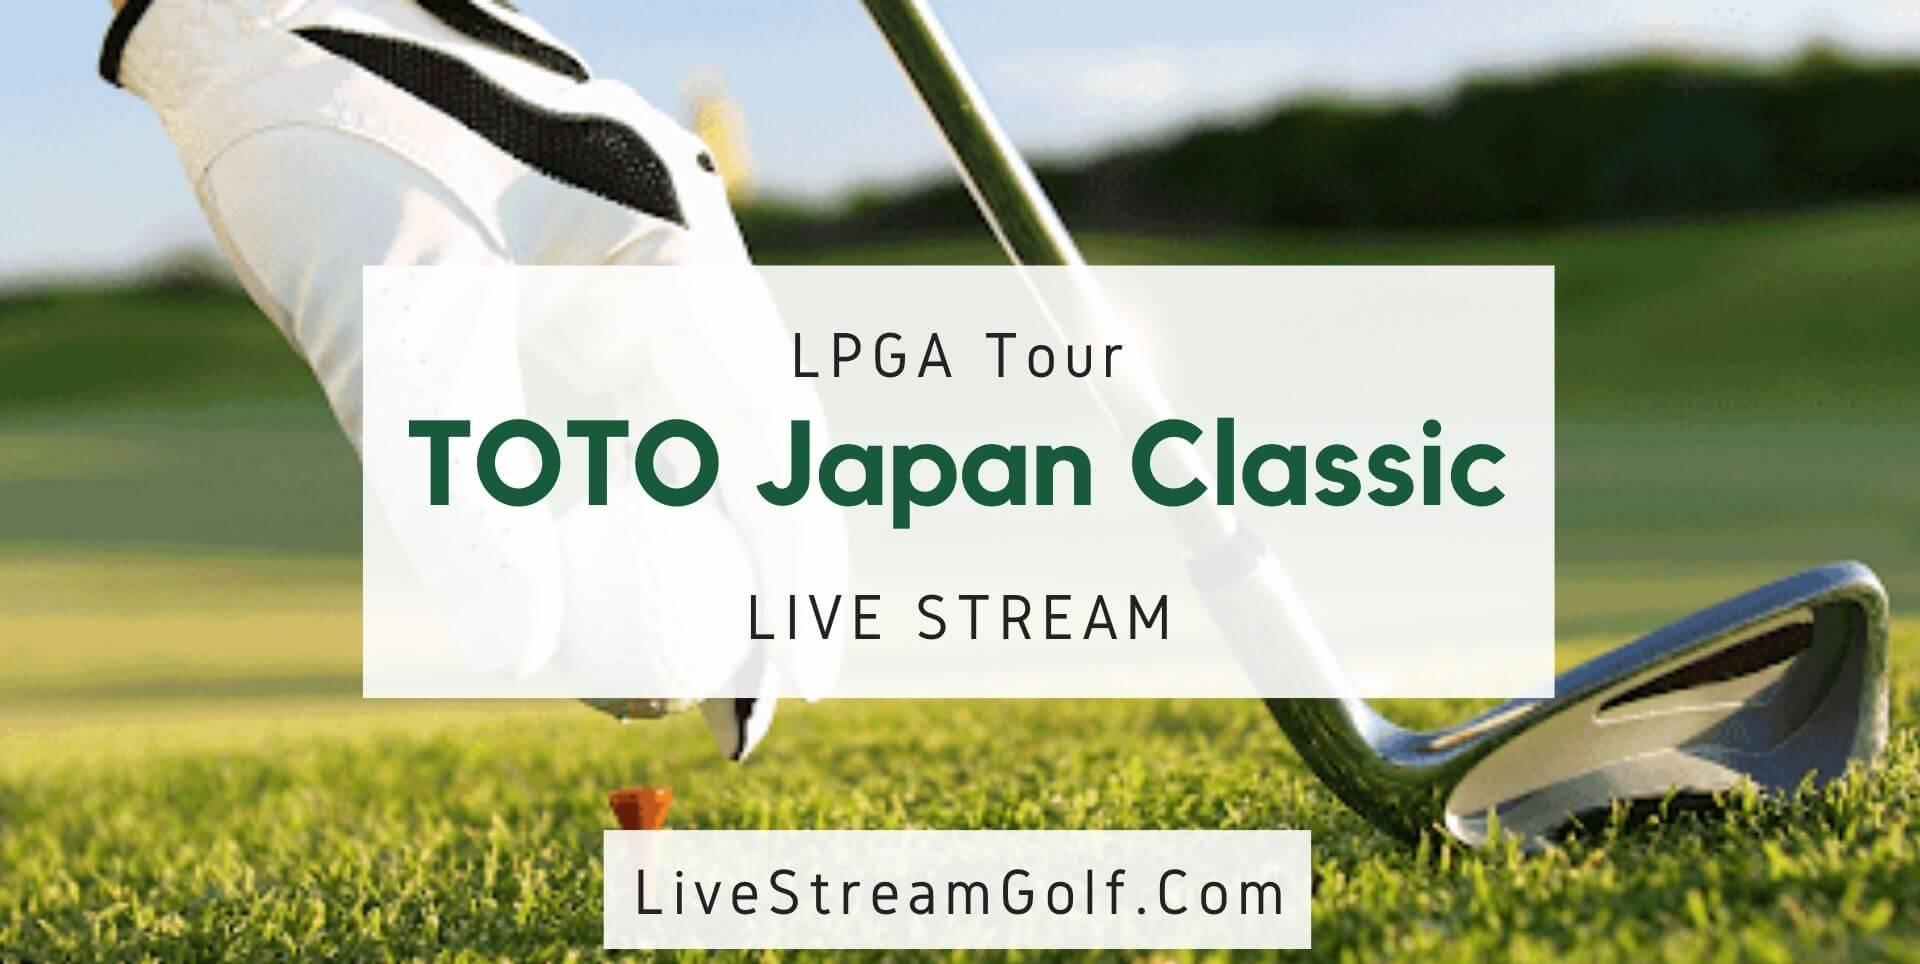 TOTO Japan Classic Rd 4 Live Stream: LPGA Tour 2021